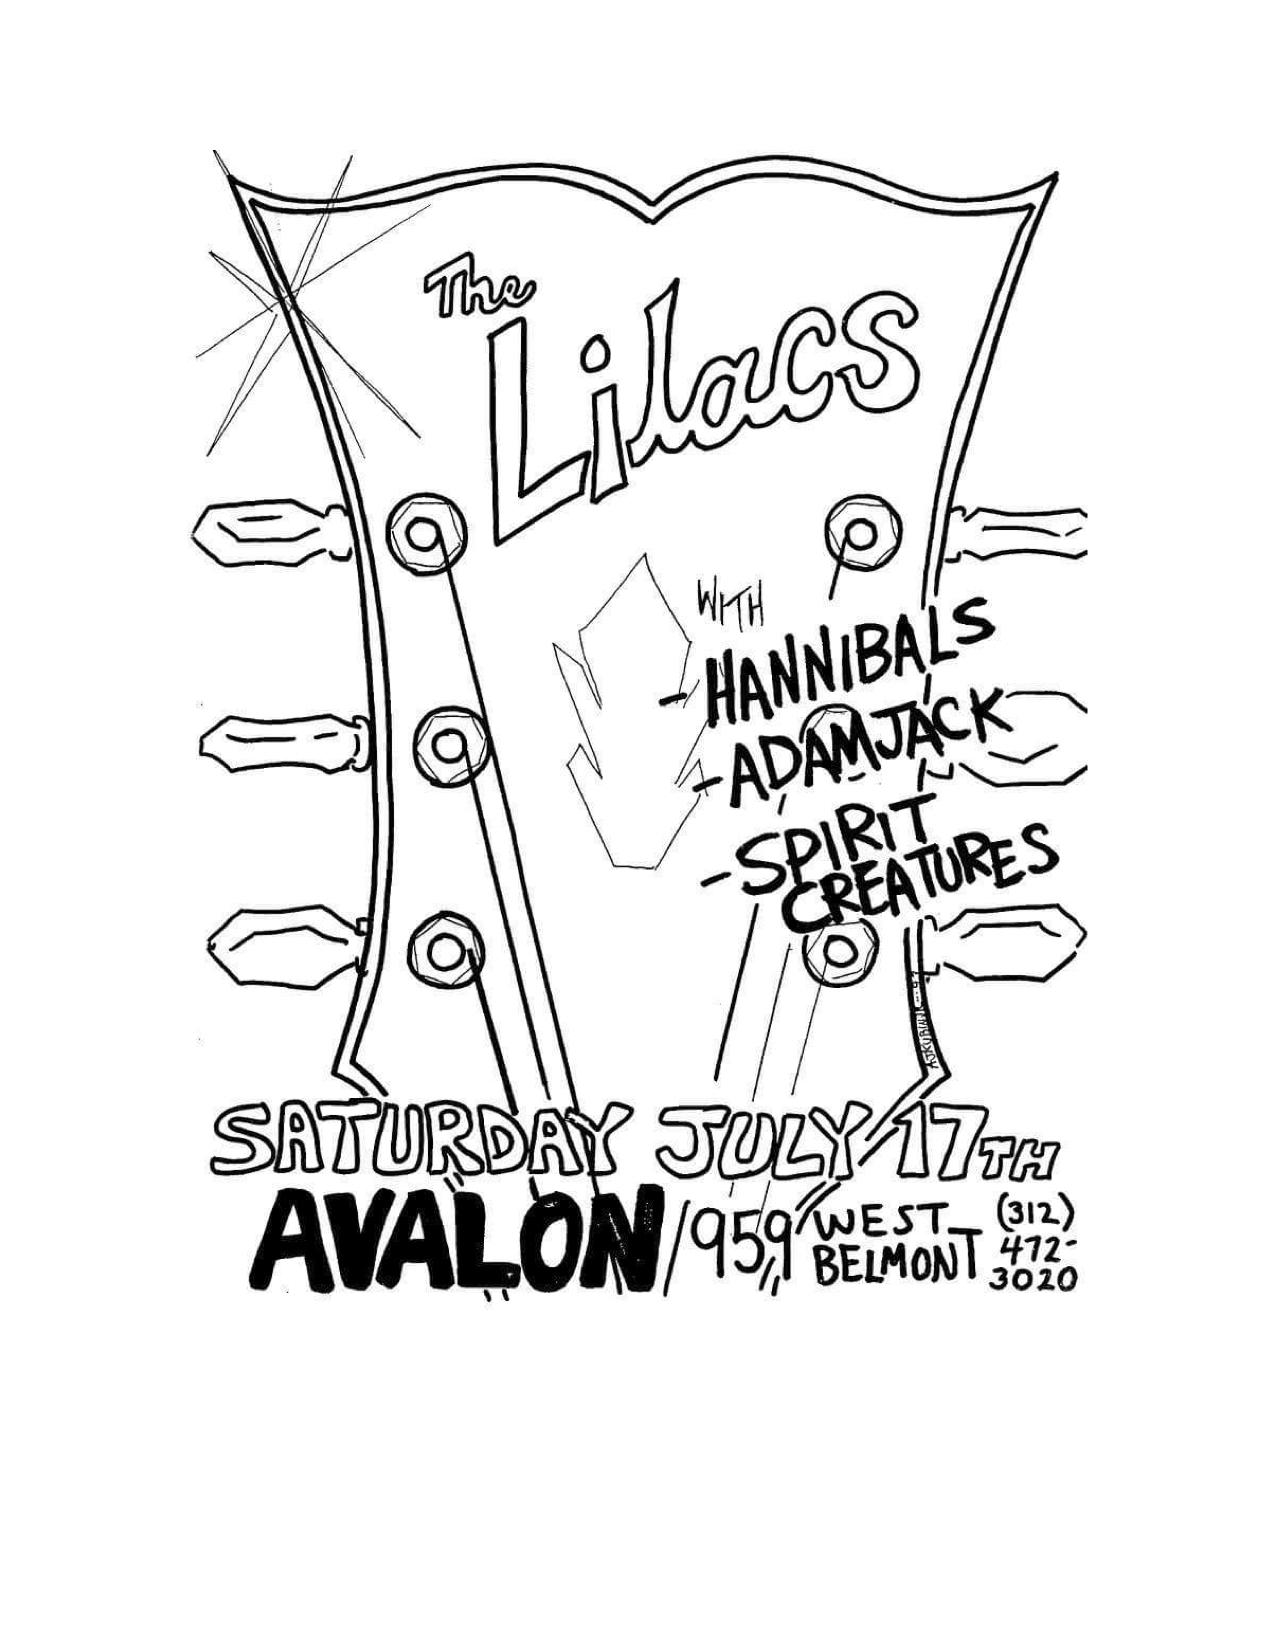 The Lilacs Poster 24 (Hannibals, Adamjack, Spirit Creatures).jpg